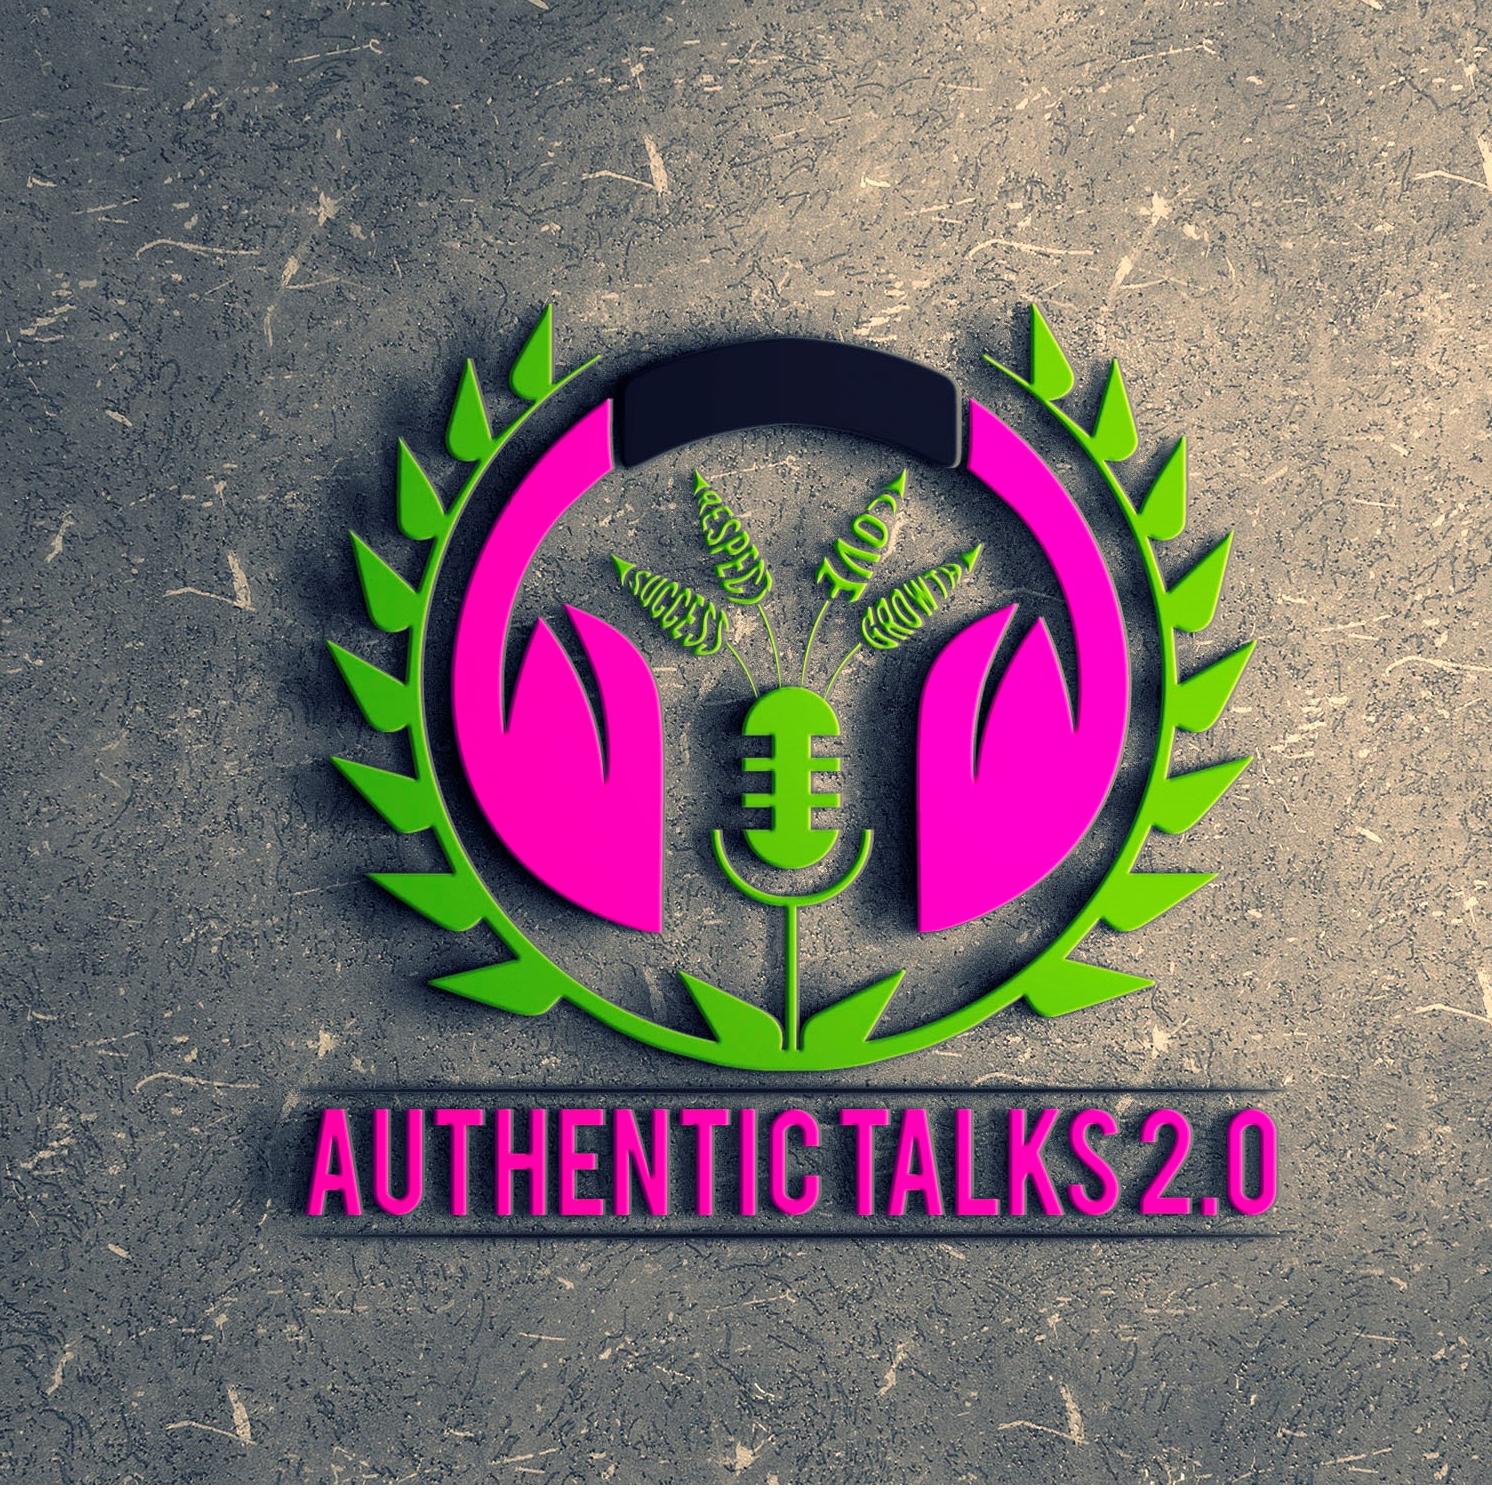 Authentic Talks 2.0 with Shanta